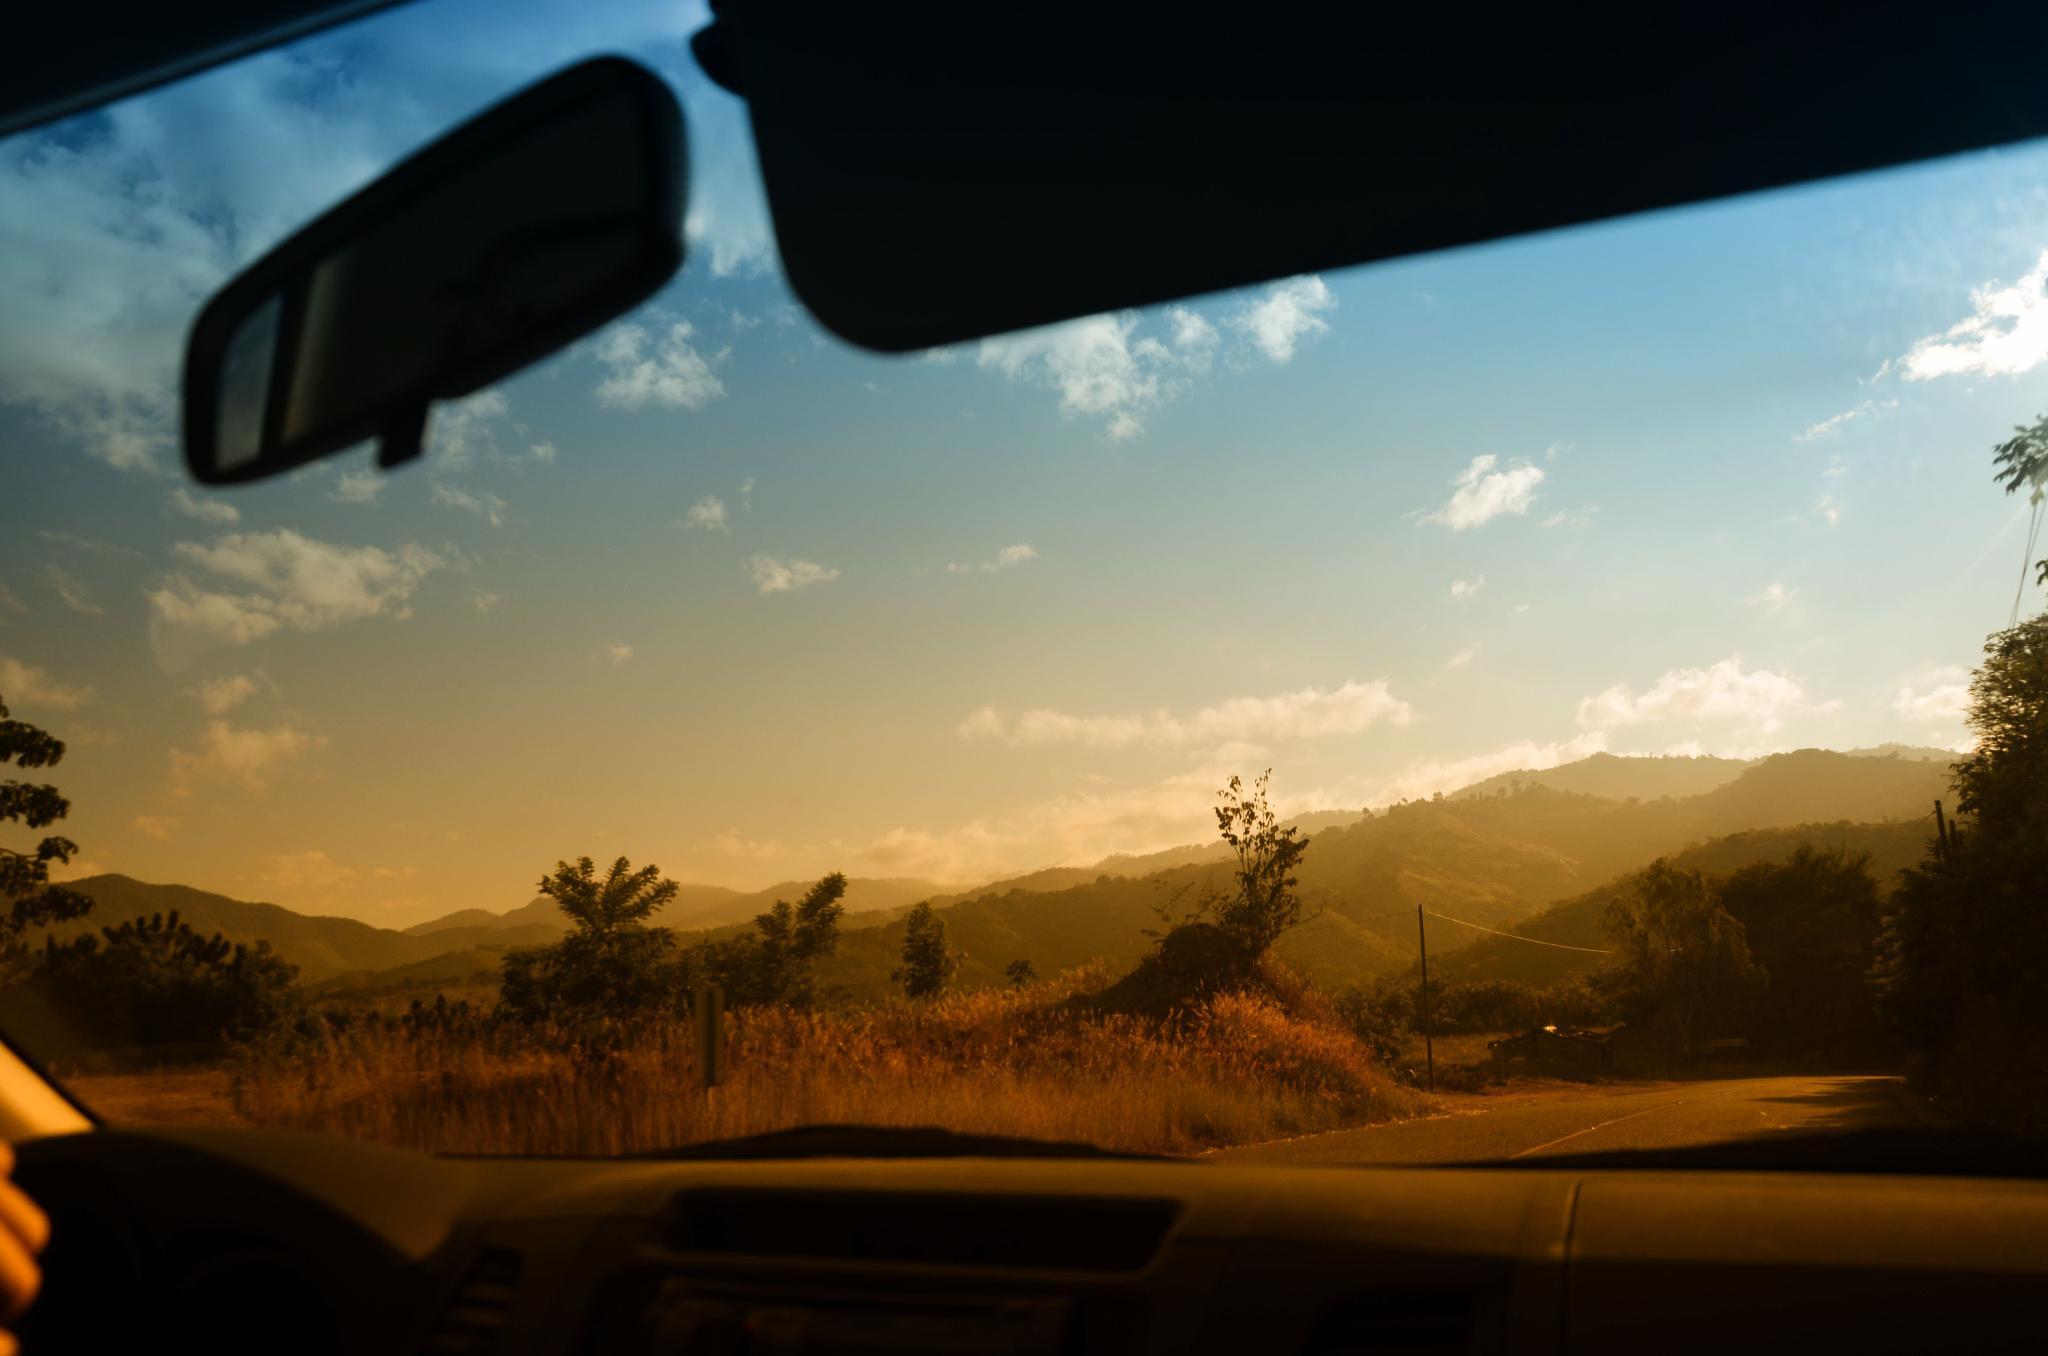 """This is the way home "" by Jorge Enrique Batz"